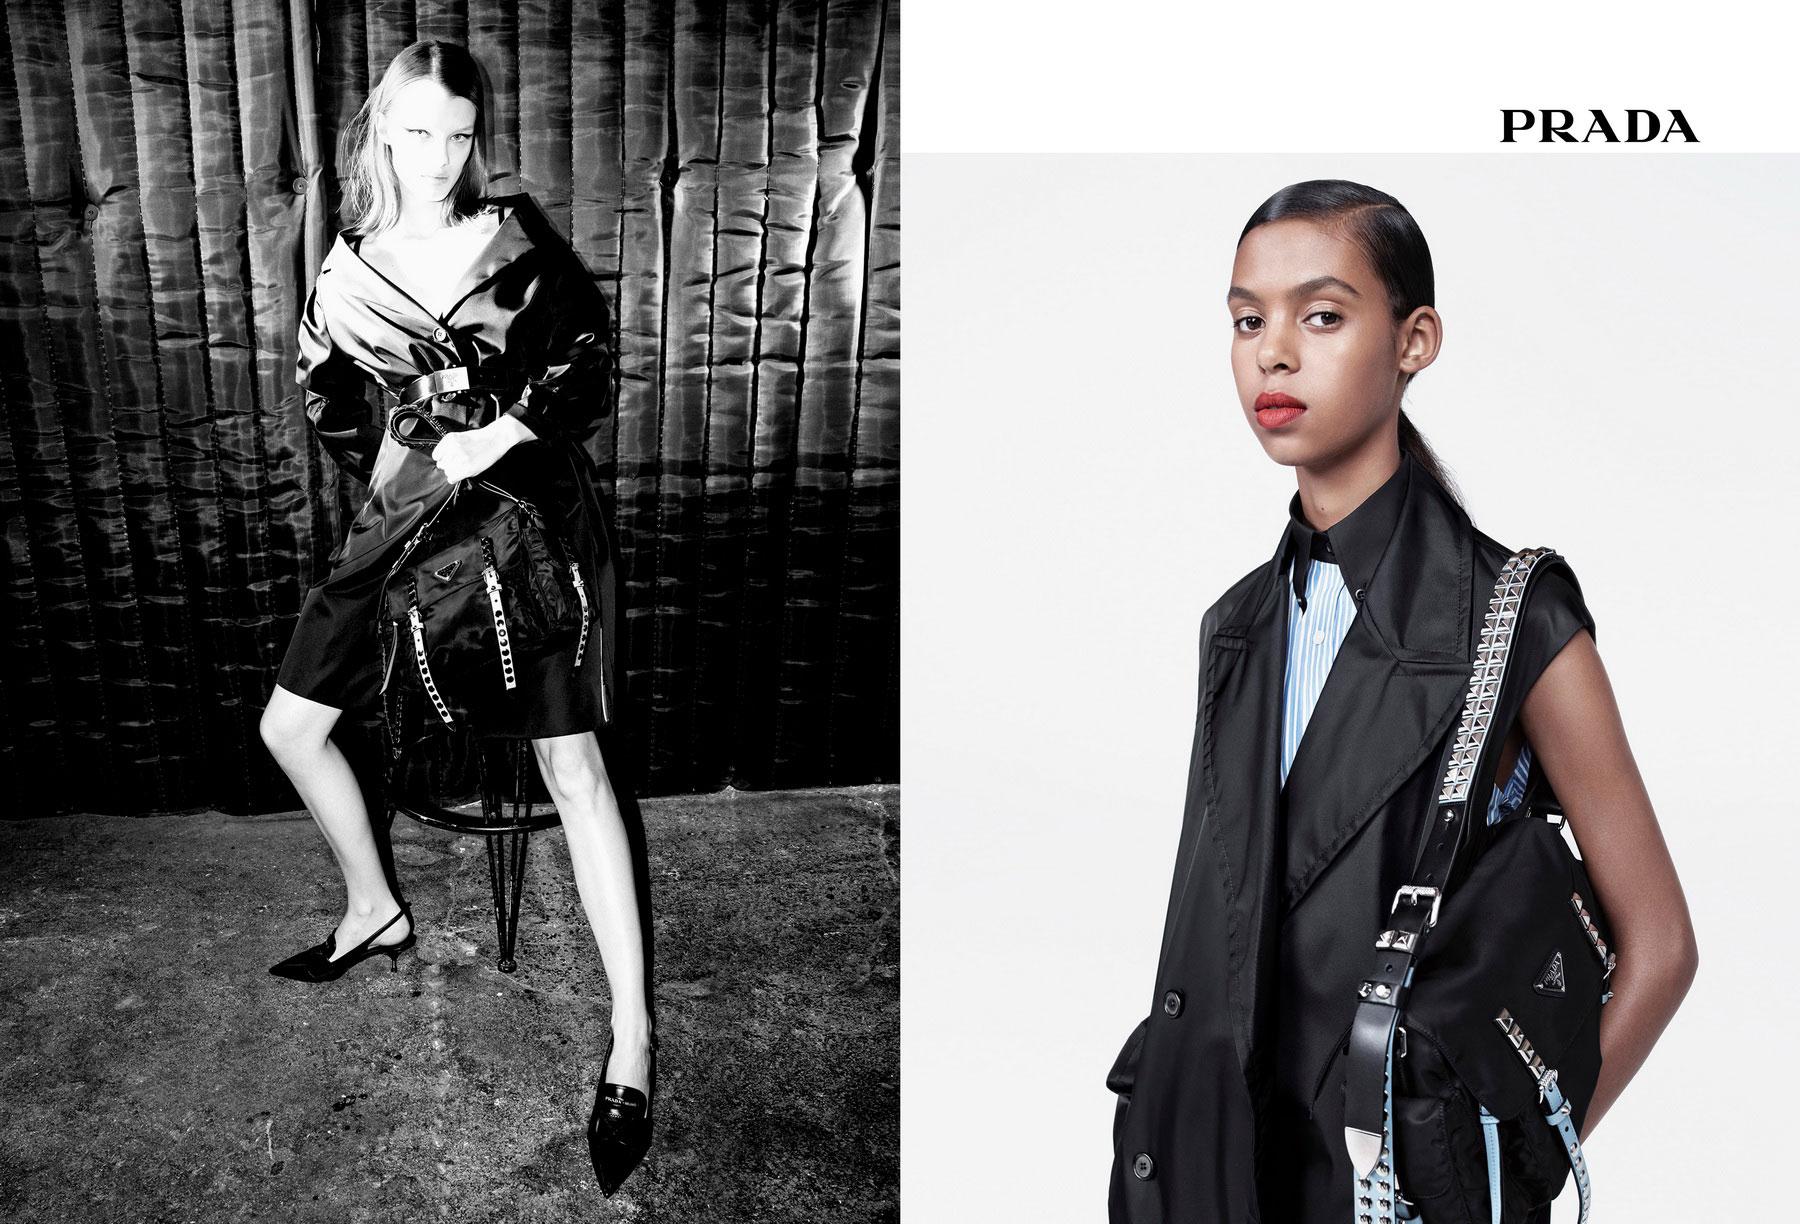 PRADA Womenswear SS18 | Black-Nylon Campaign